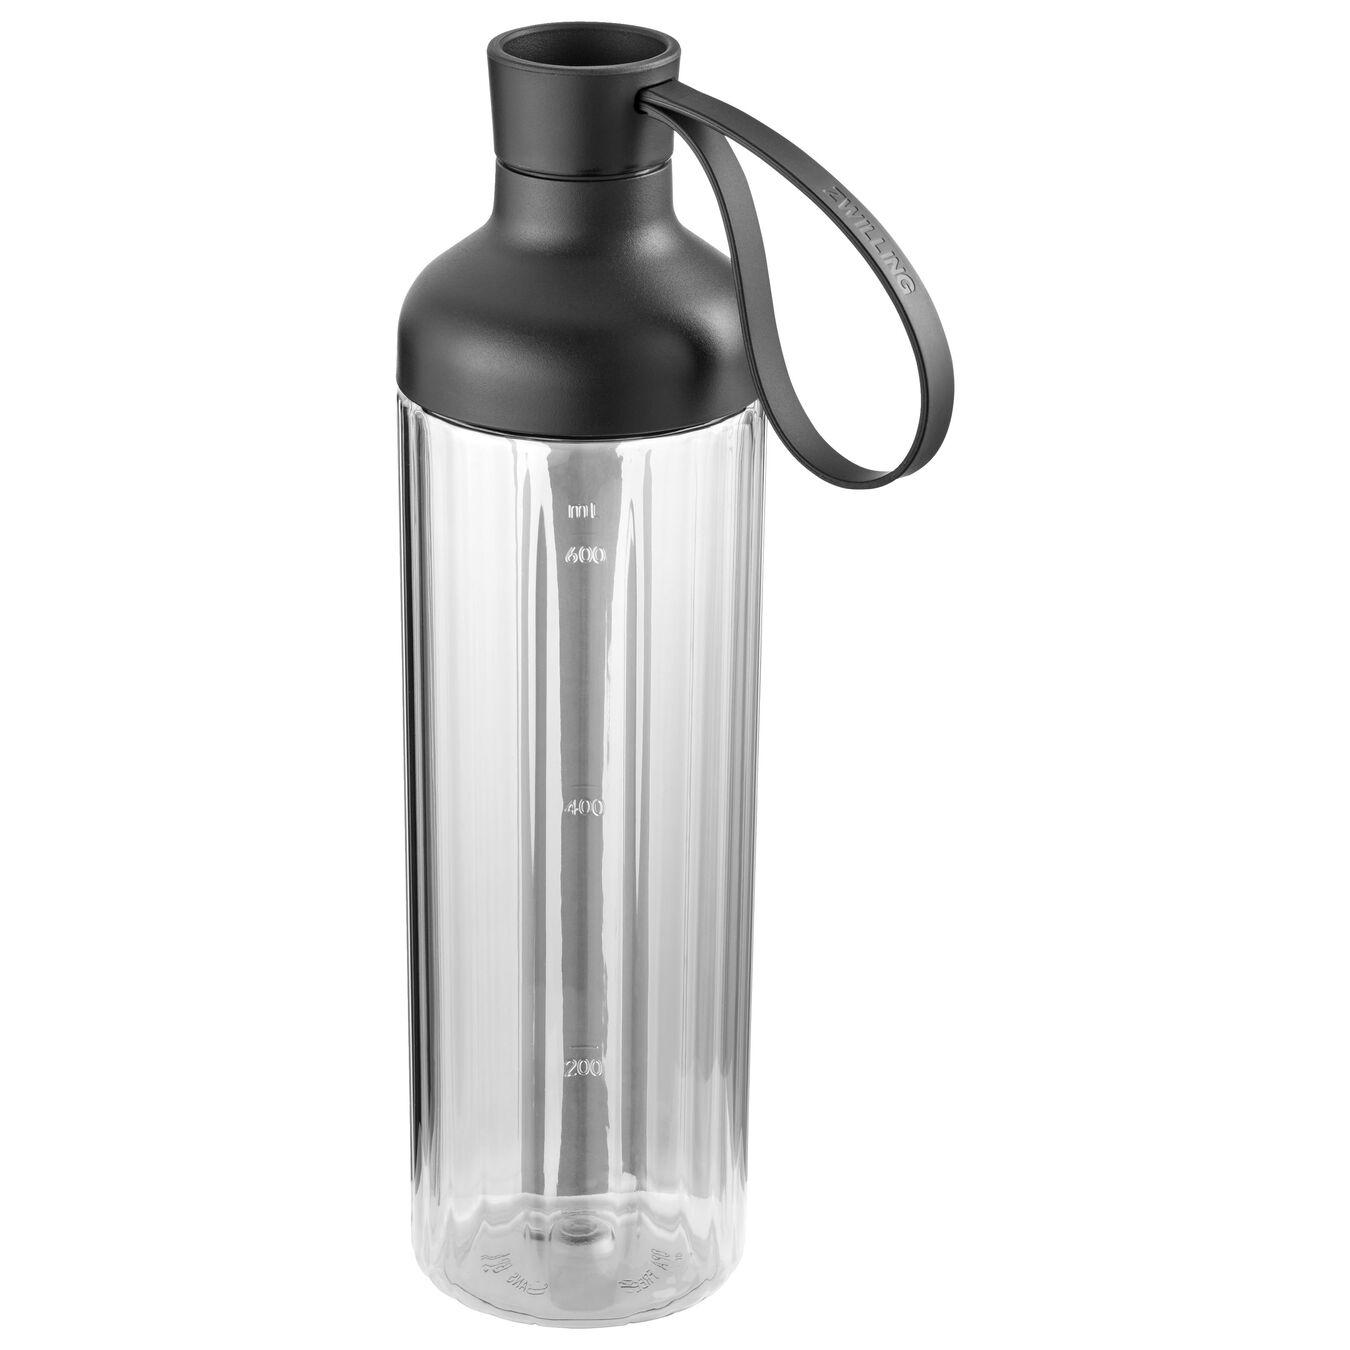 Behälter, Tritan | Transparent | 0.6 l,,large 3